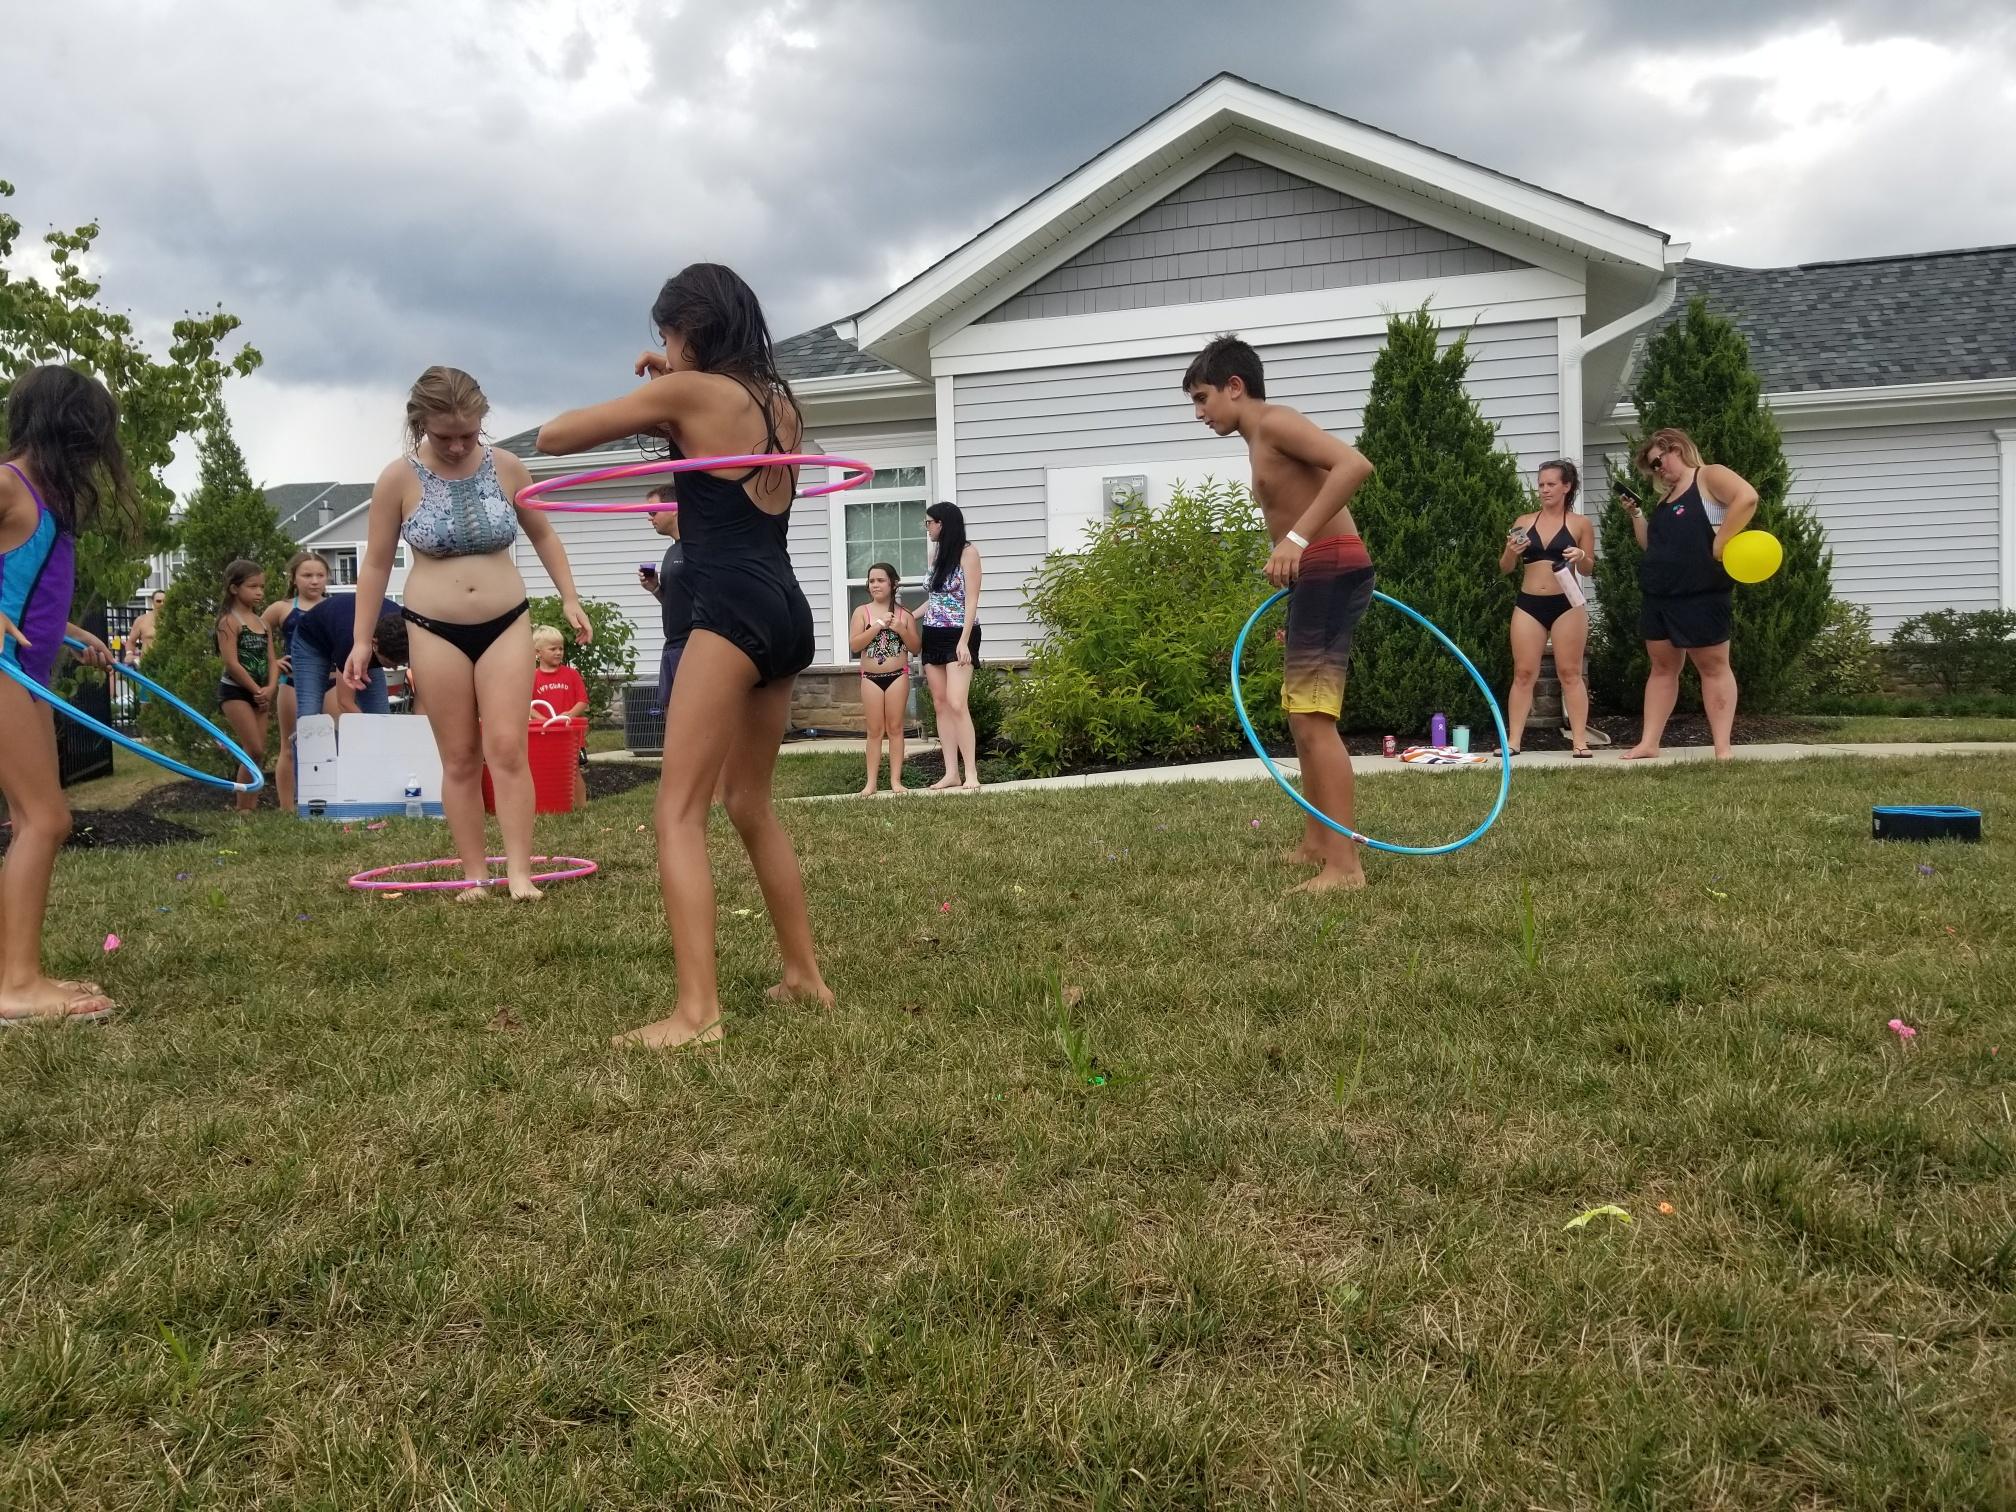 2019 Avanti Apartments Pool Party - Hula Hooping